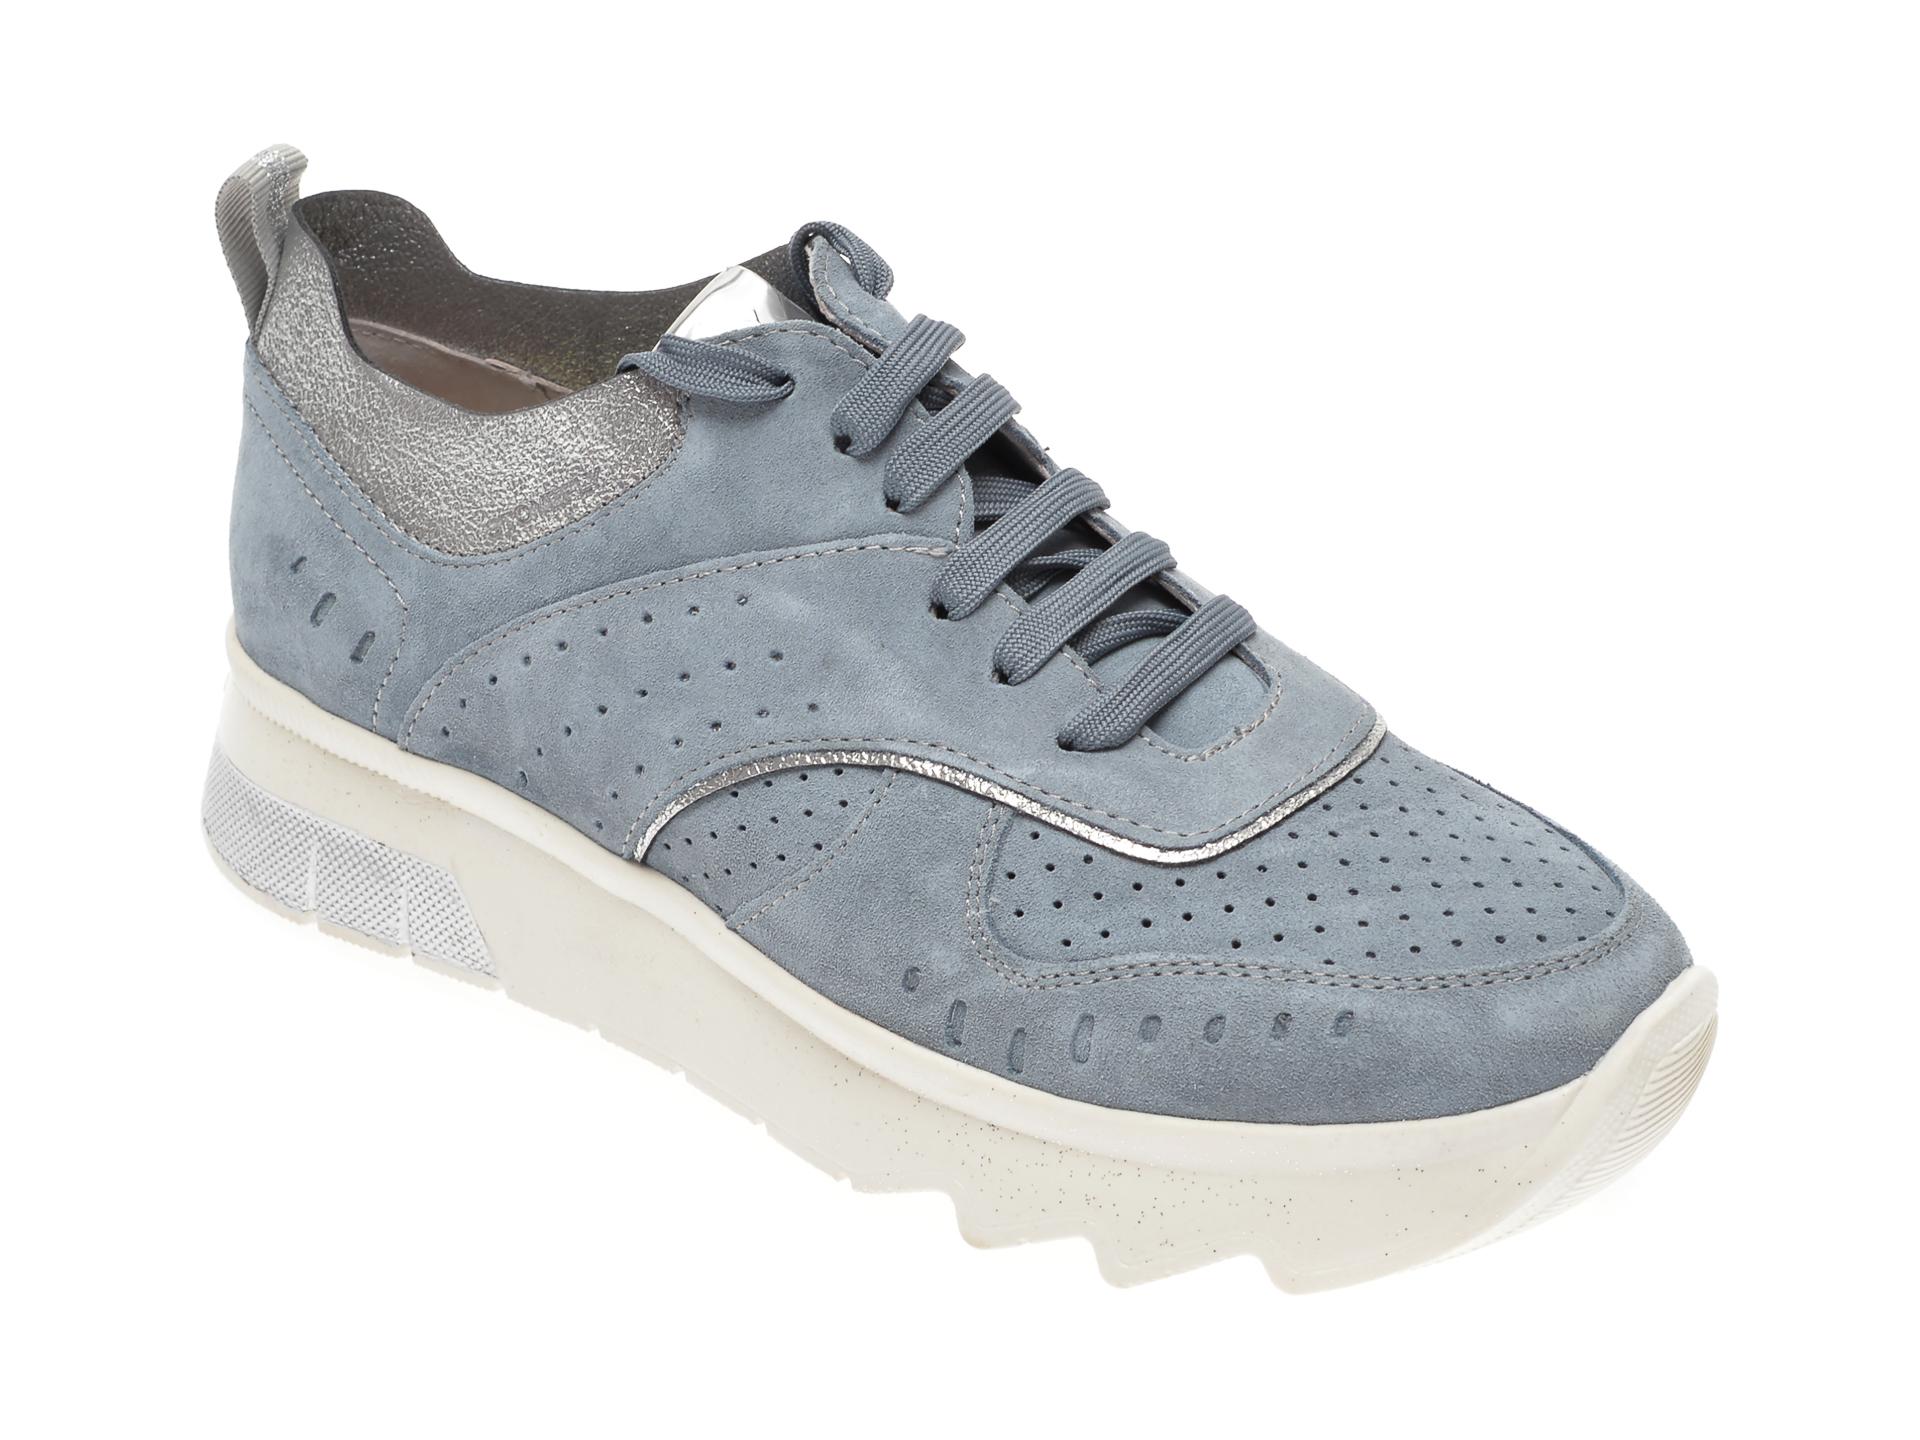 Pantofi STONEFLY albastri, SPOCK14, din piele naturala